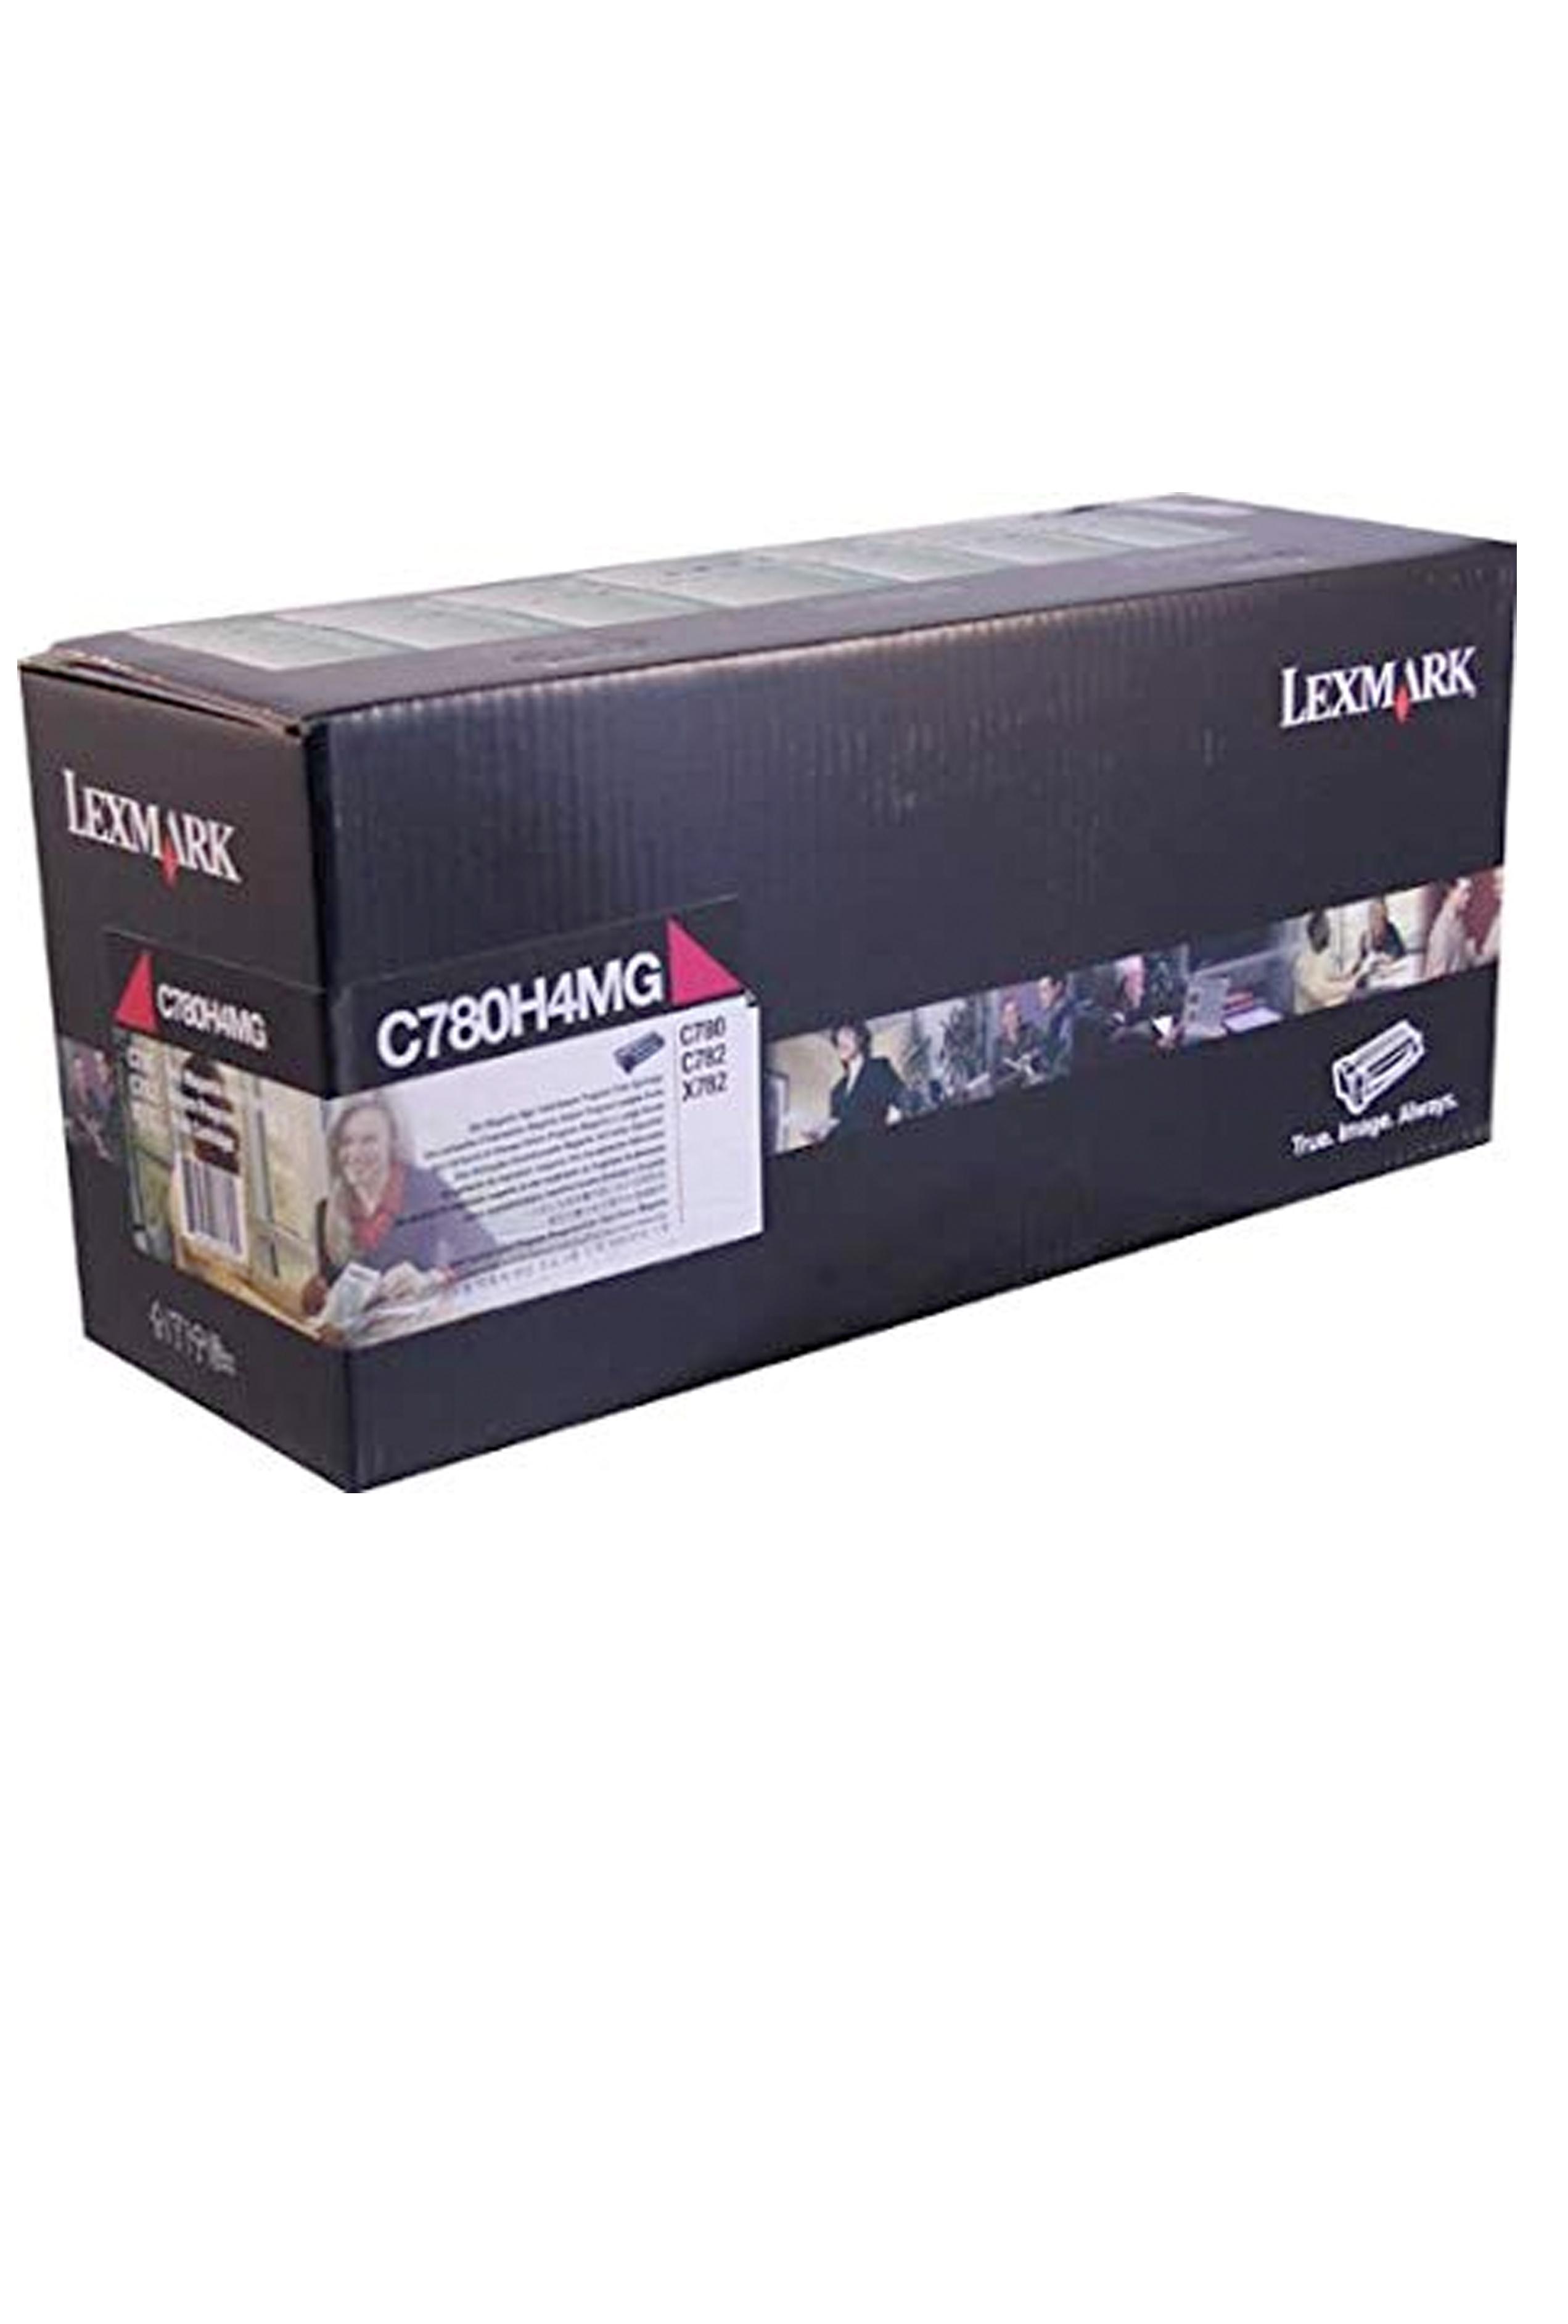 Lexmark LEXMARK MAGENTA HIGH YIELD RETURN PROGRAM PRINT CARTRIDGE (GOVT CONTRACT) (C780H4MG)